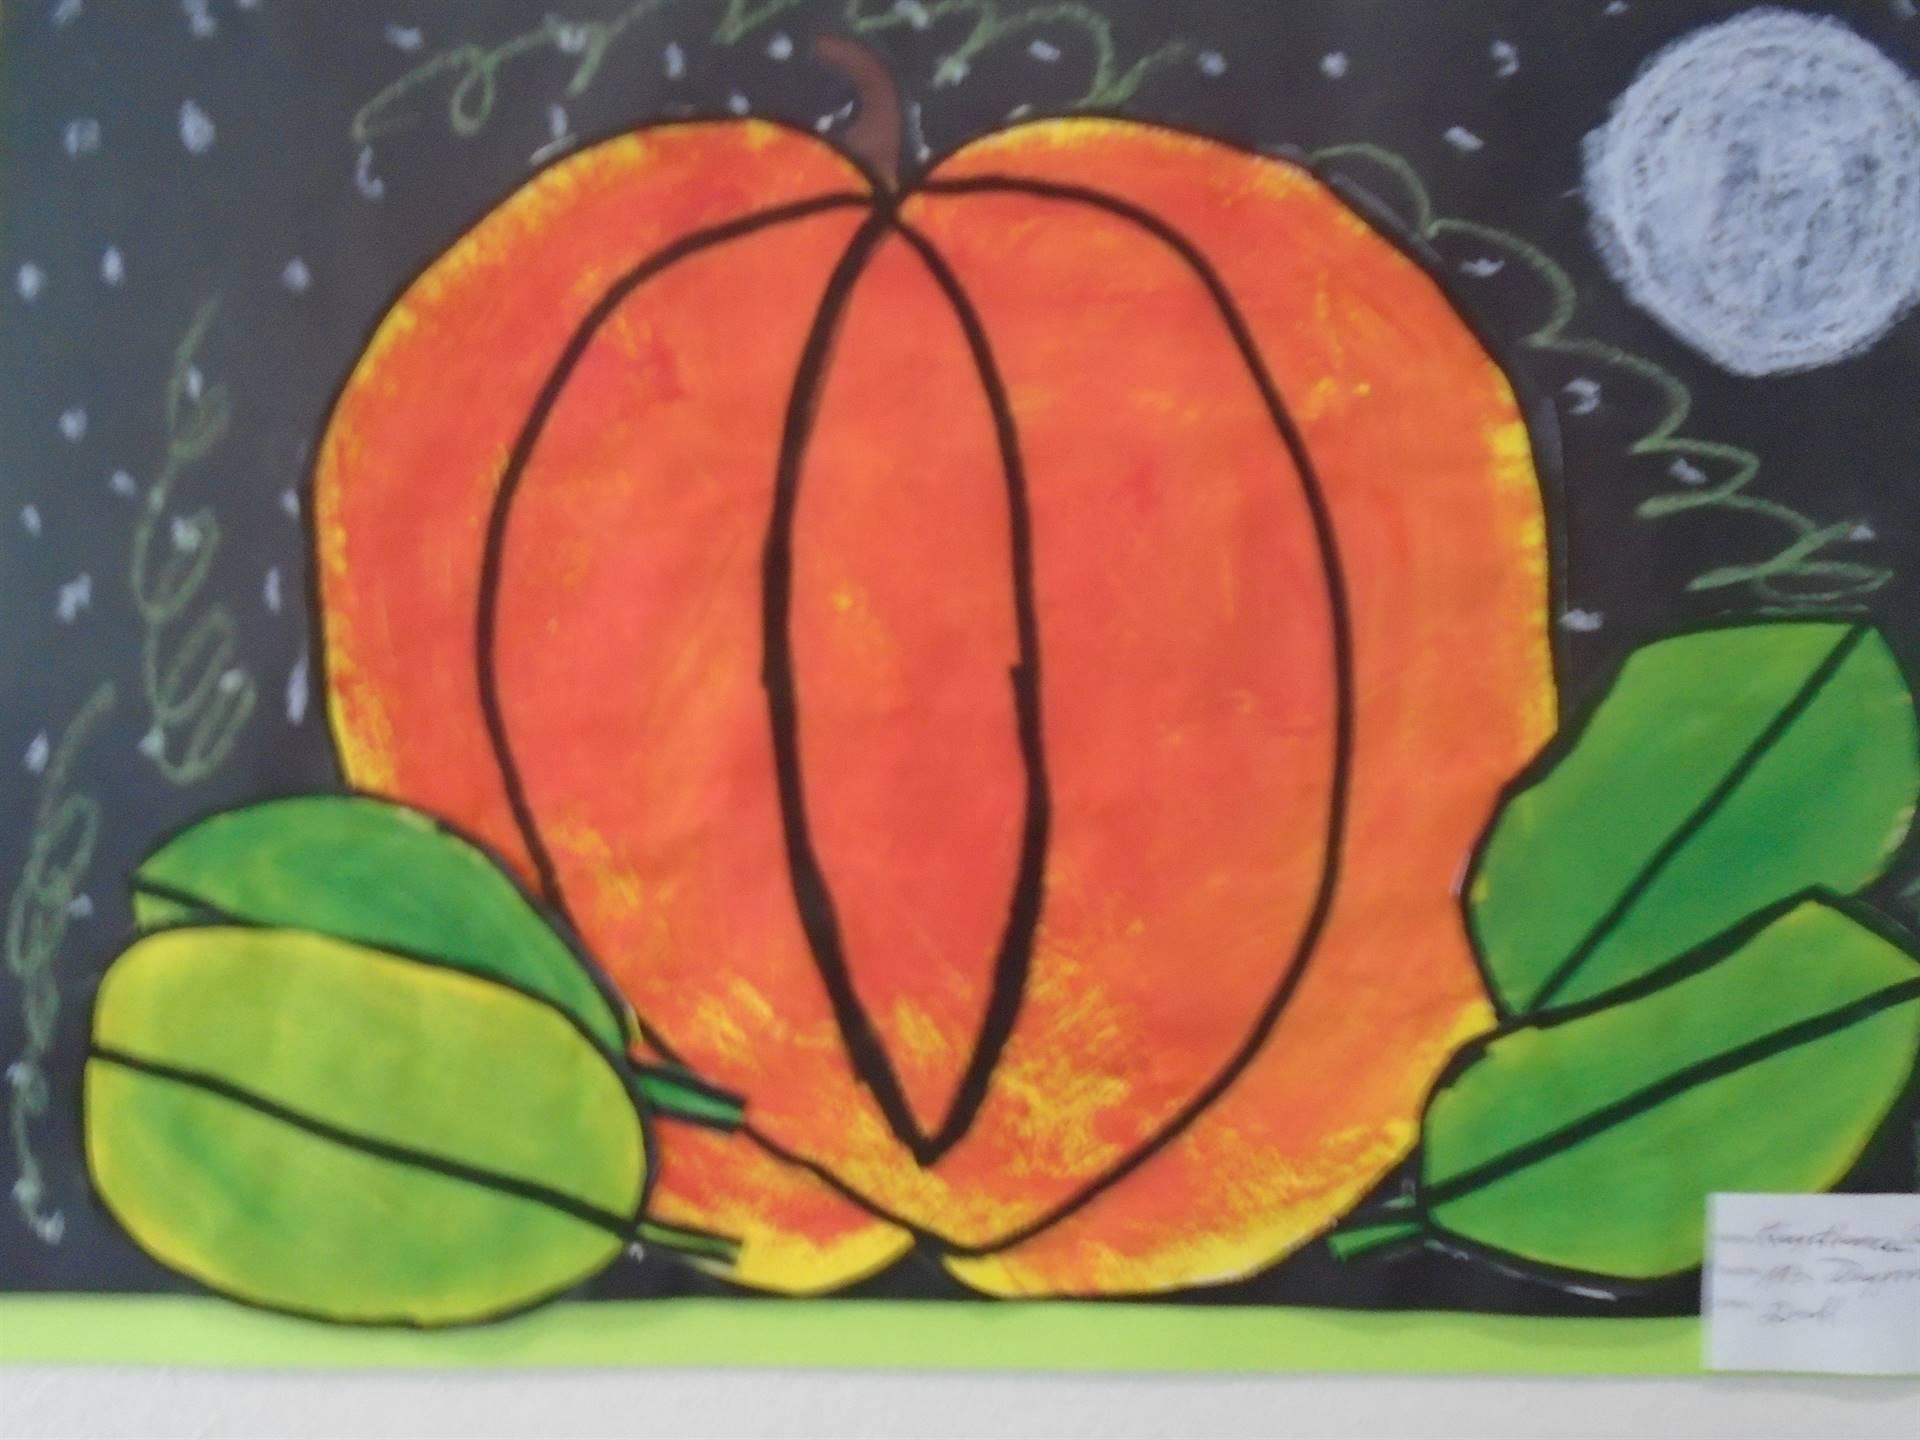 Painting of a Pumpkin at Night